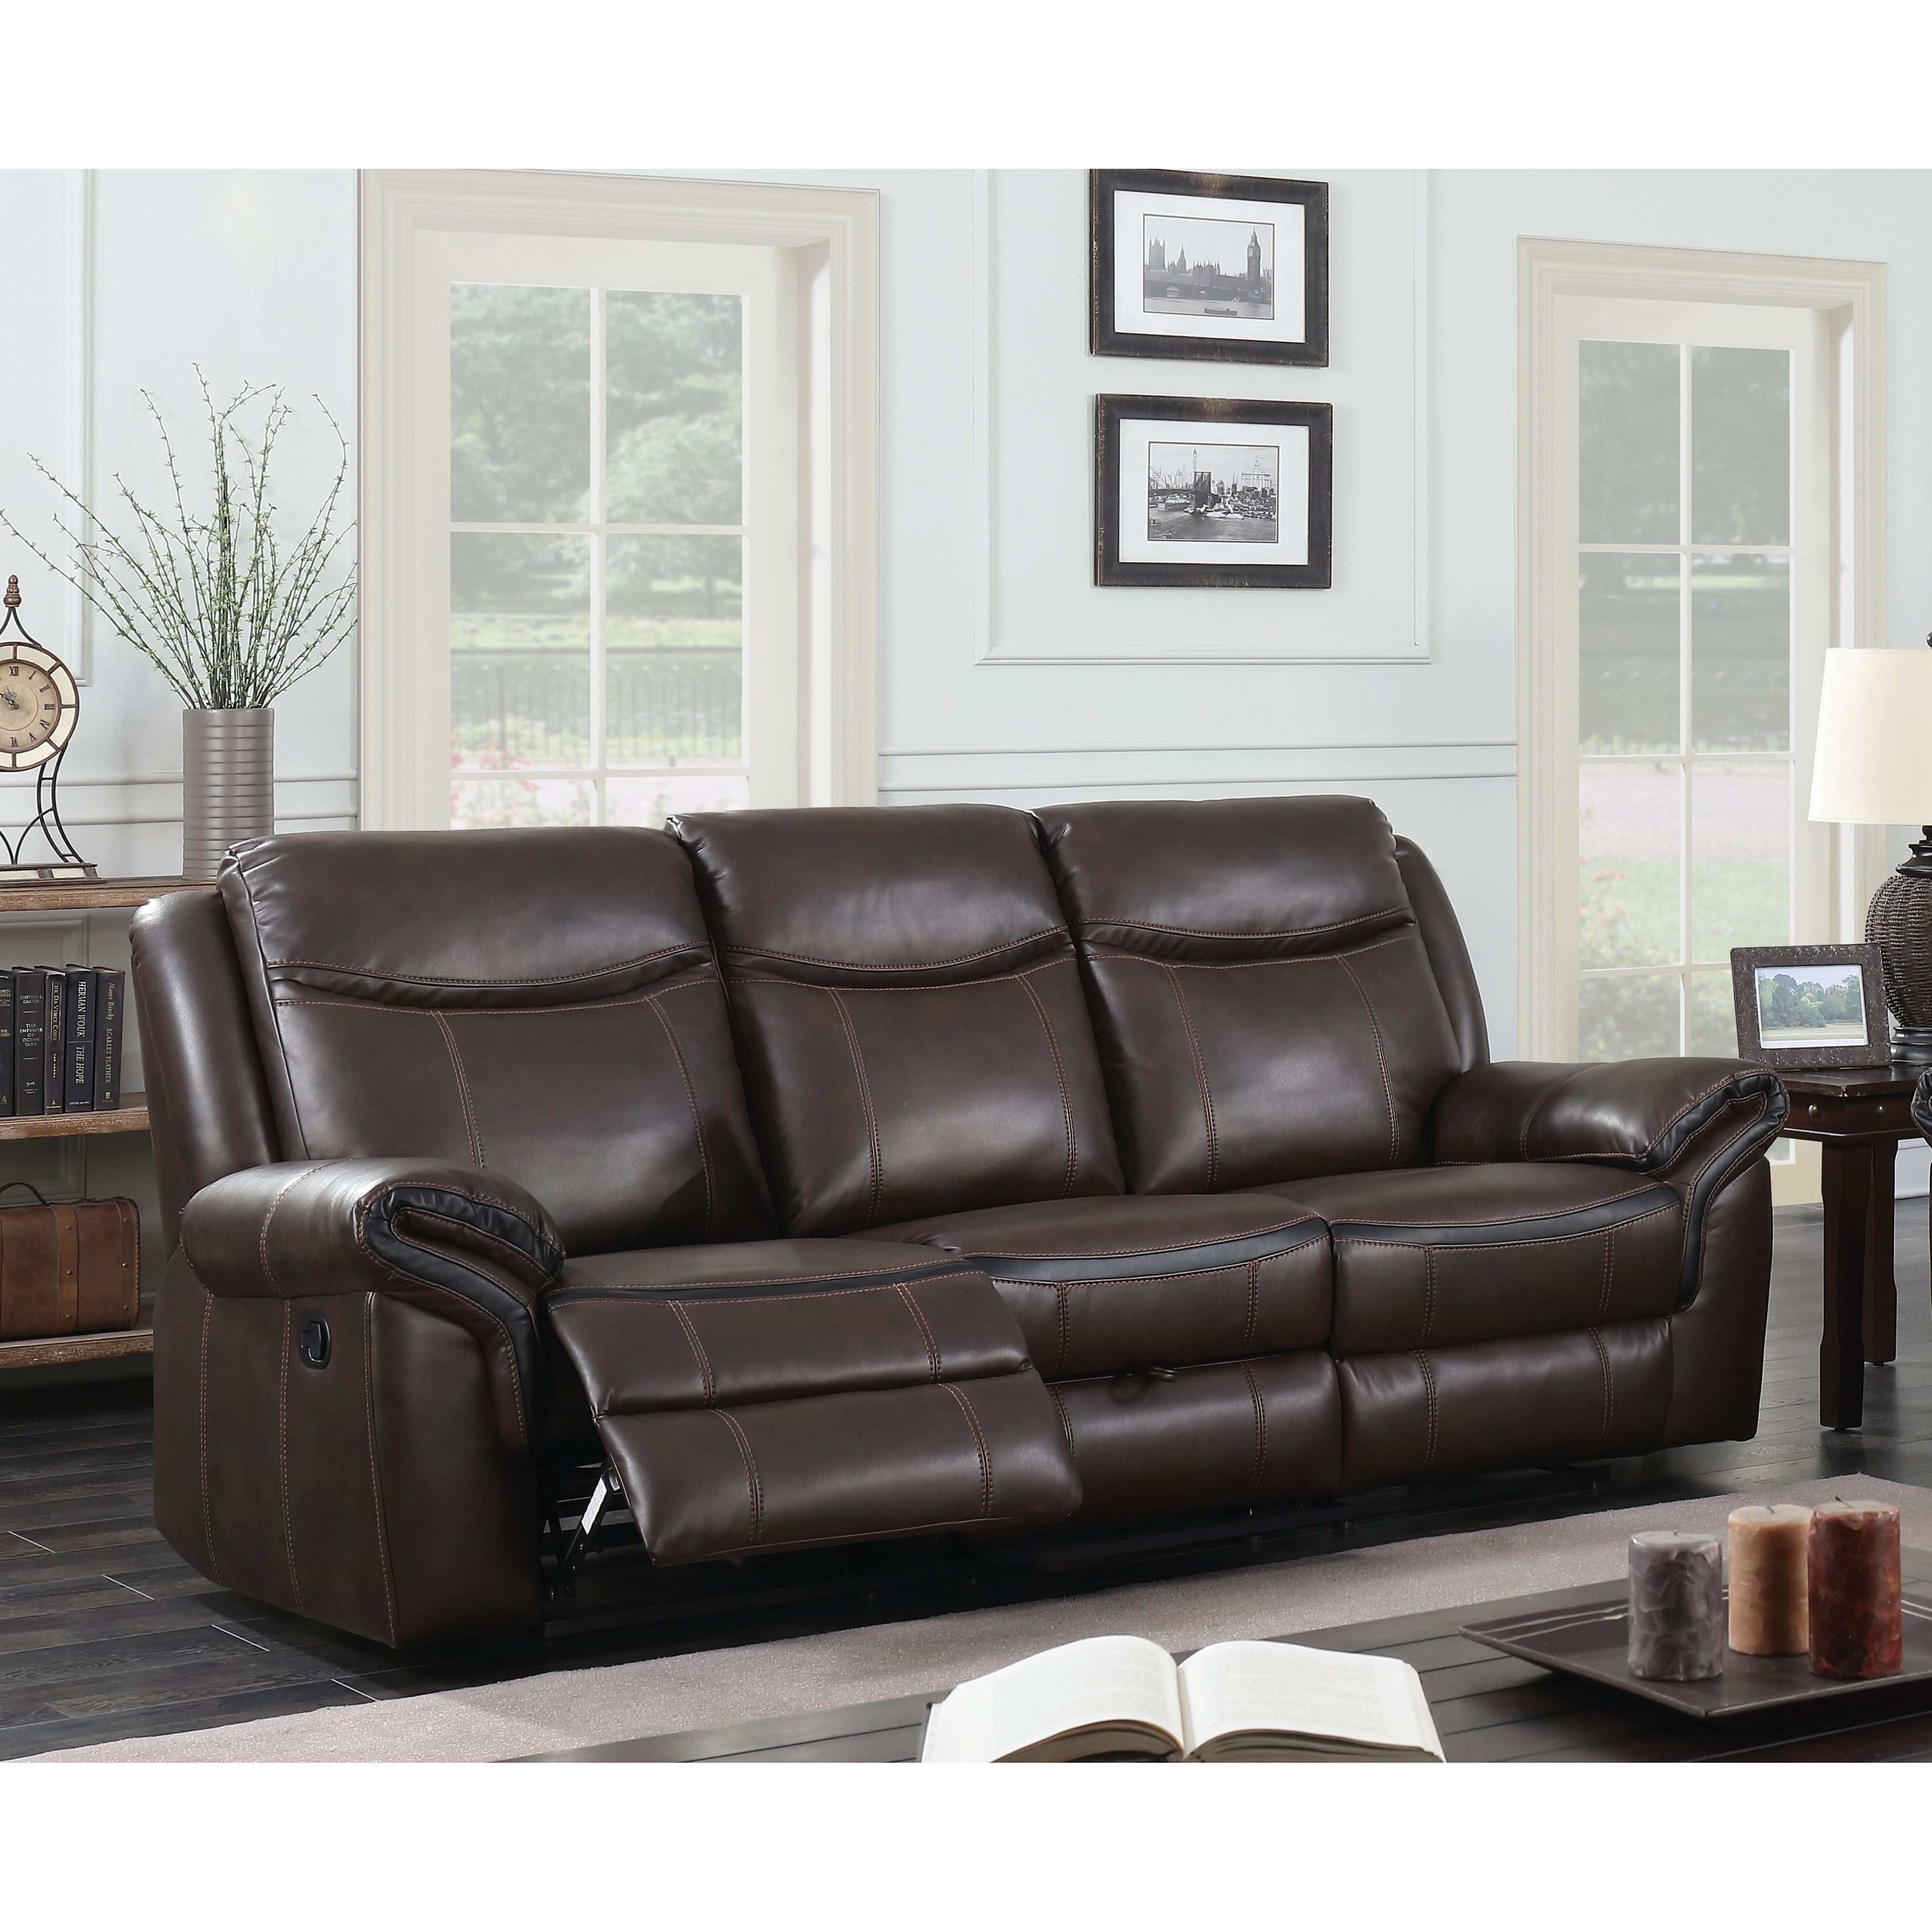 Awe Inspiring Jefferson Transitional Brown Reclining Sofa By Foa Machost Co Dining Chair Design Ideas Machostcouk